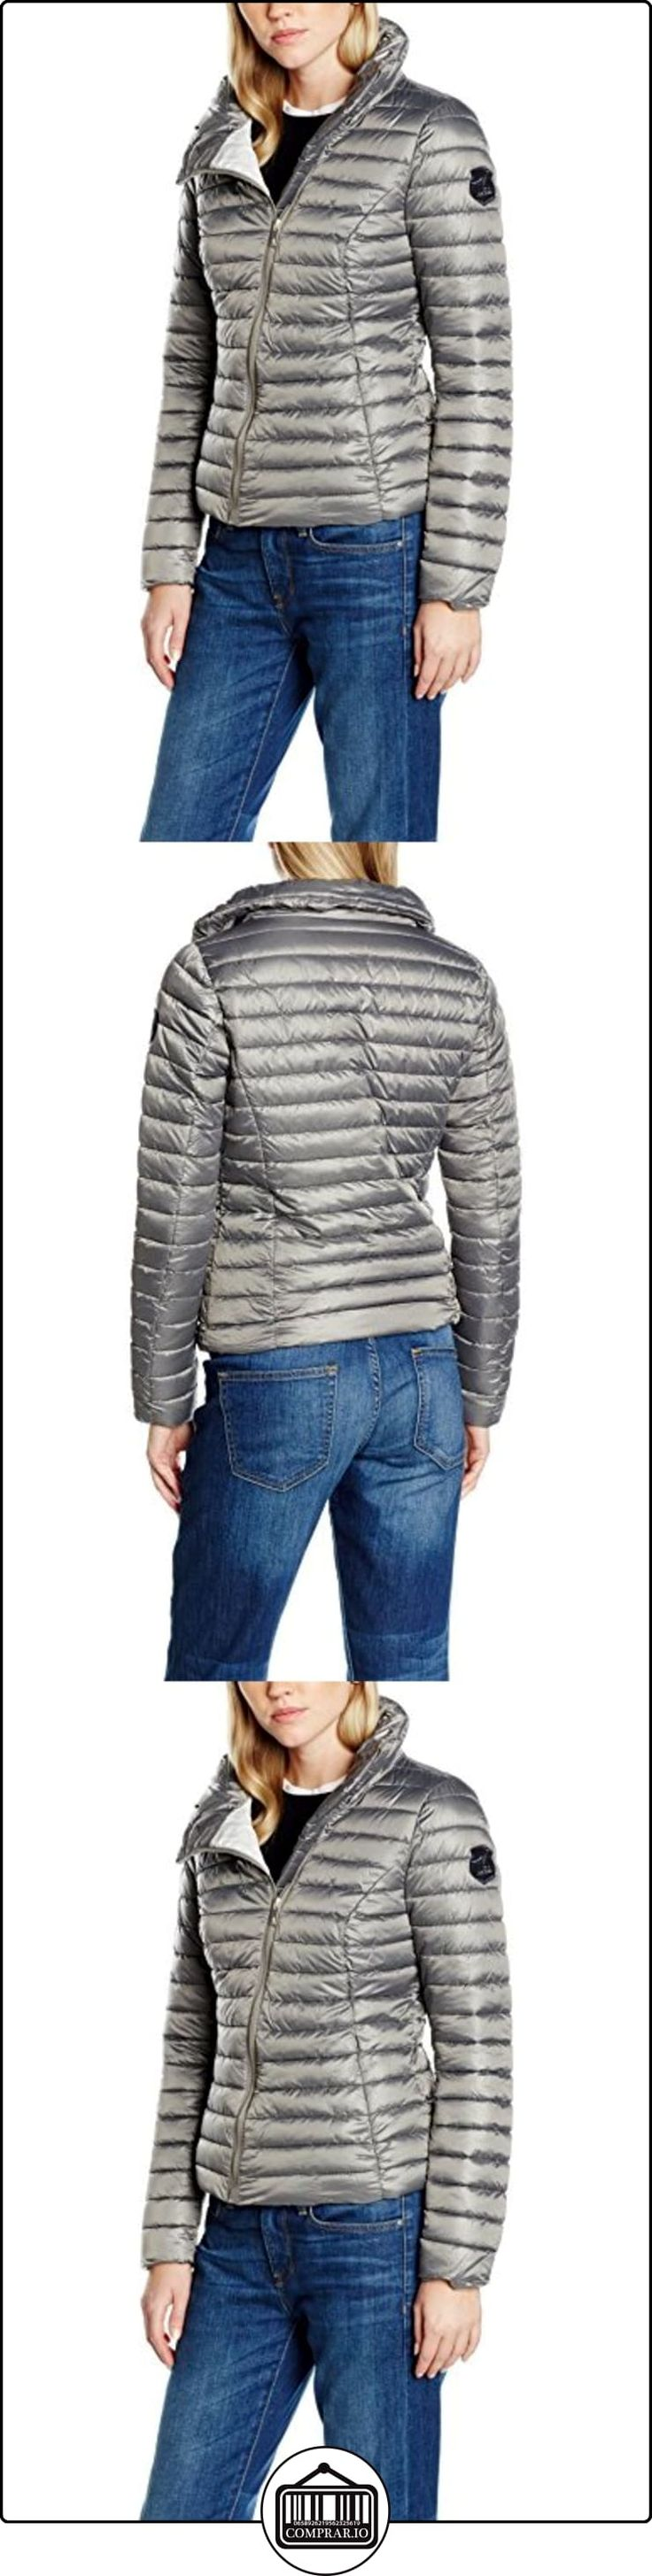 LPB Woman W167803, Impermeable para Mujer, Gris (Perle), Medium  ✿ Abrigos y chaquetas ✿